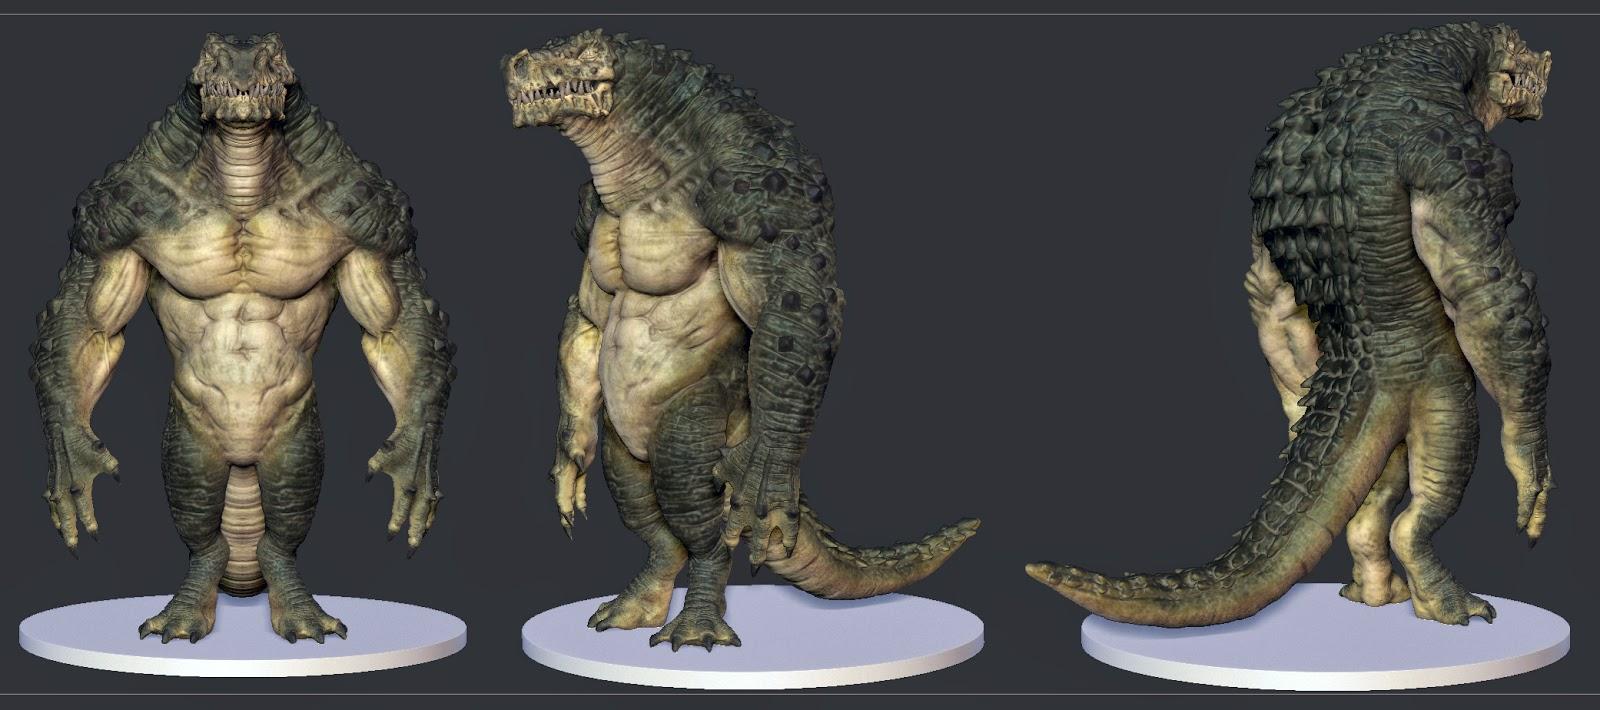 Gator_002.jpg